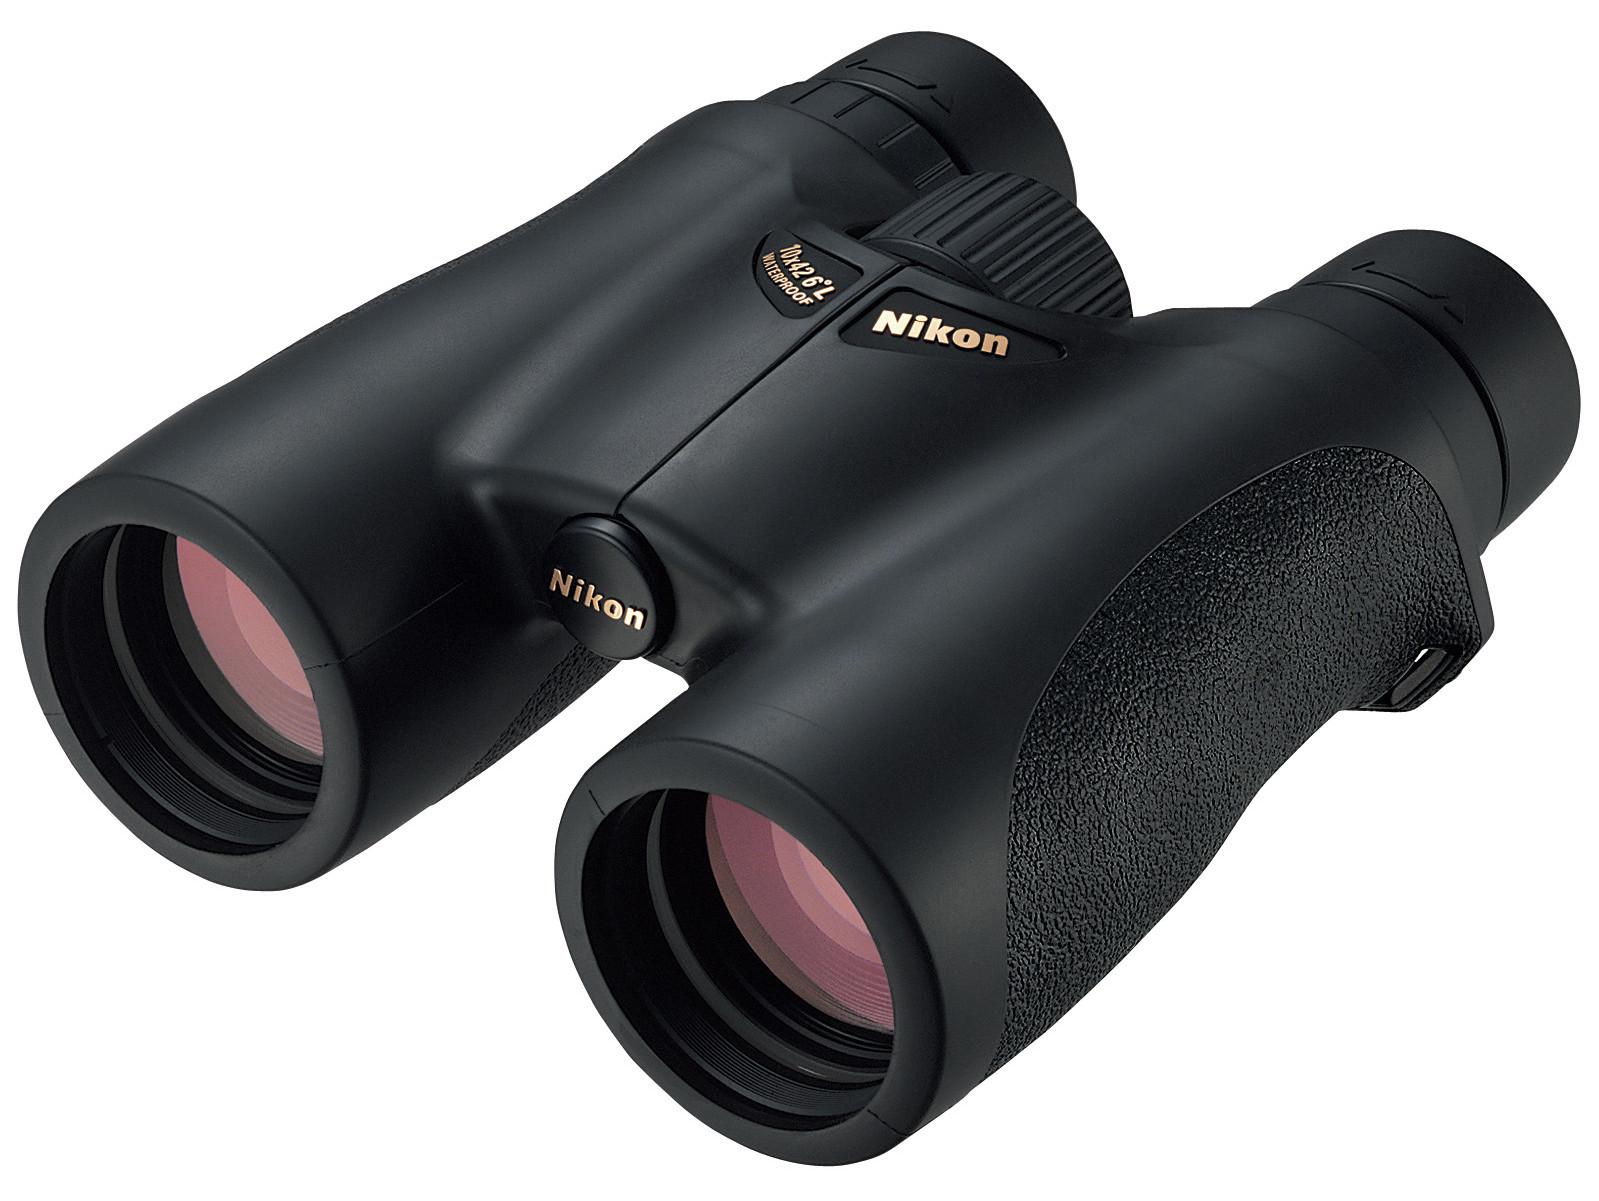 HG L DCF WP 10X42 雙筒望遠鏡 雙筒望遠鏡/單眼鏡-登山賞鳥